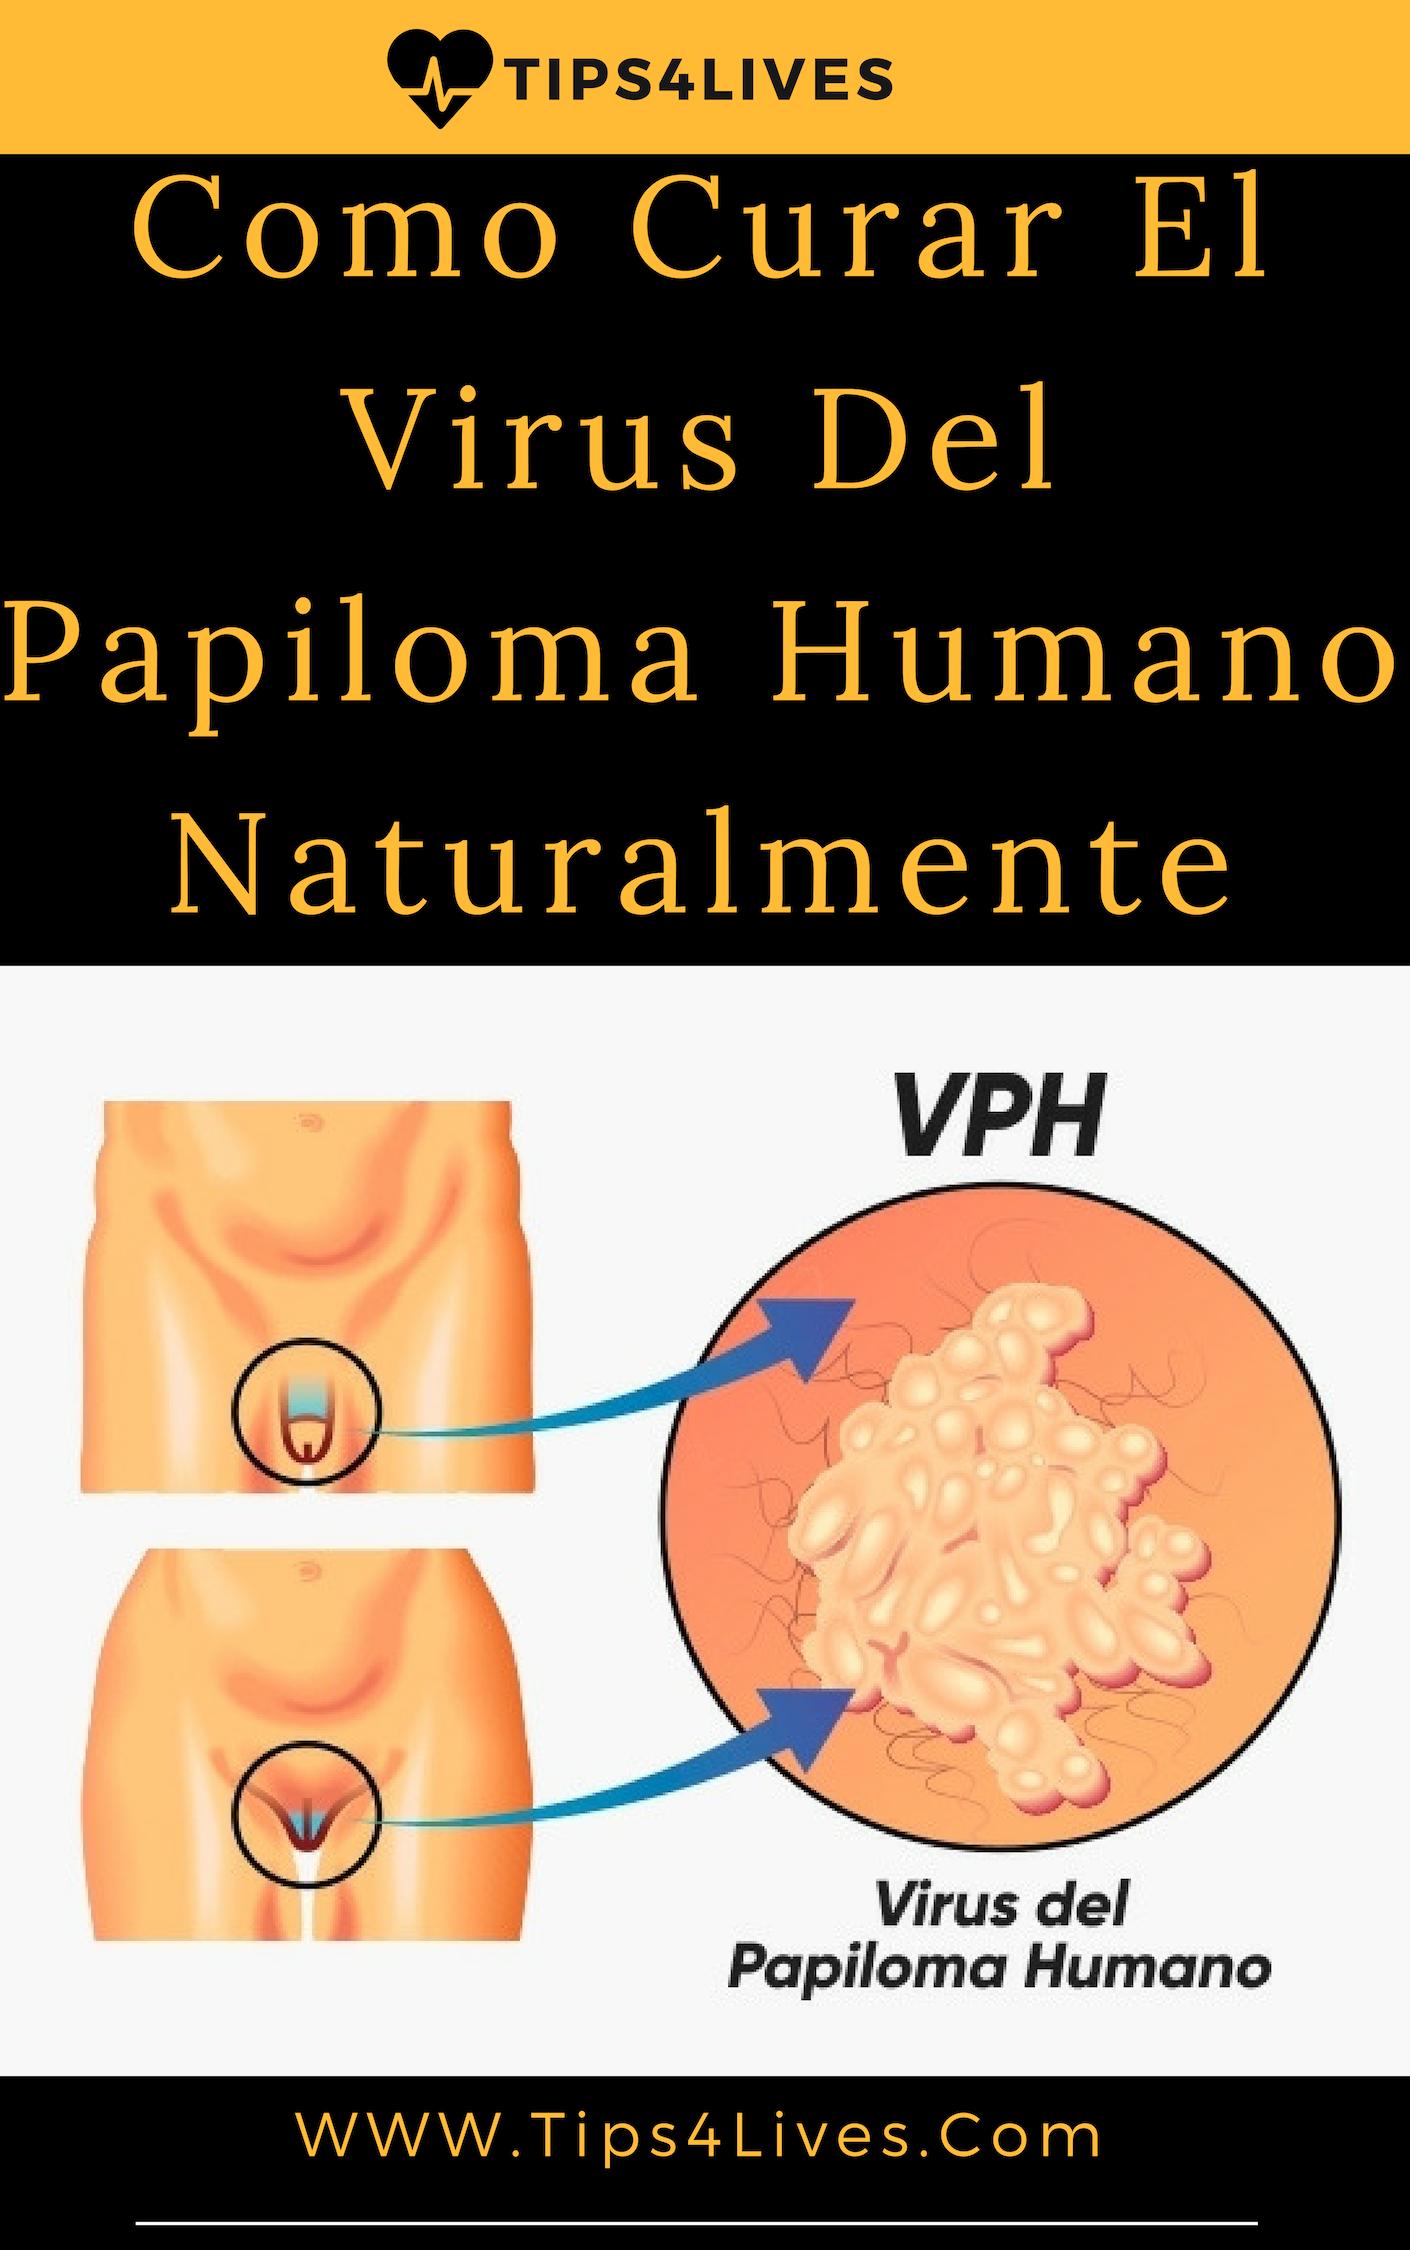 papiloma genital masculino tratamiento cheloo munca in folosul